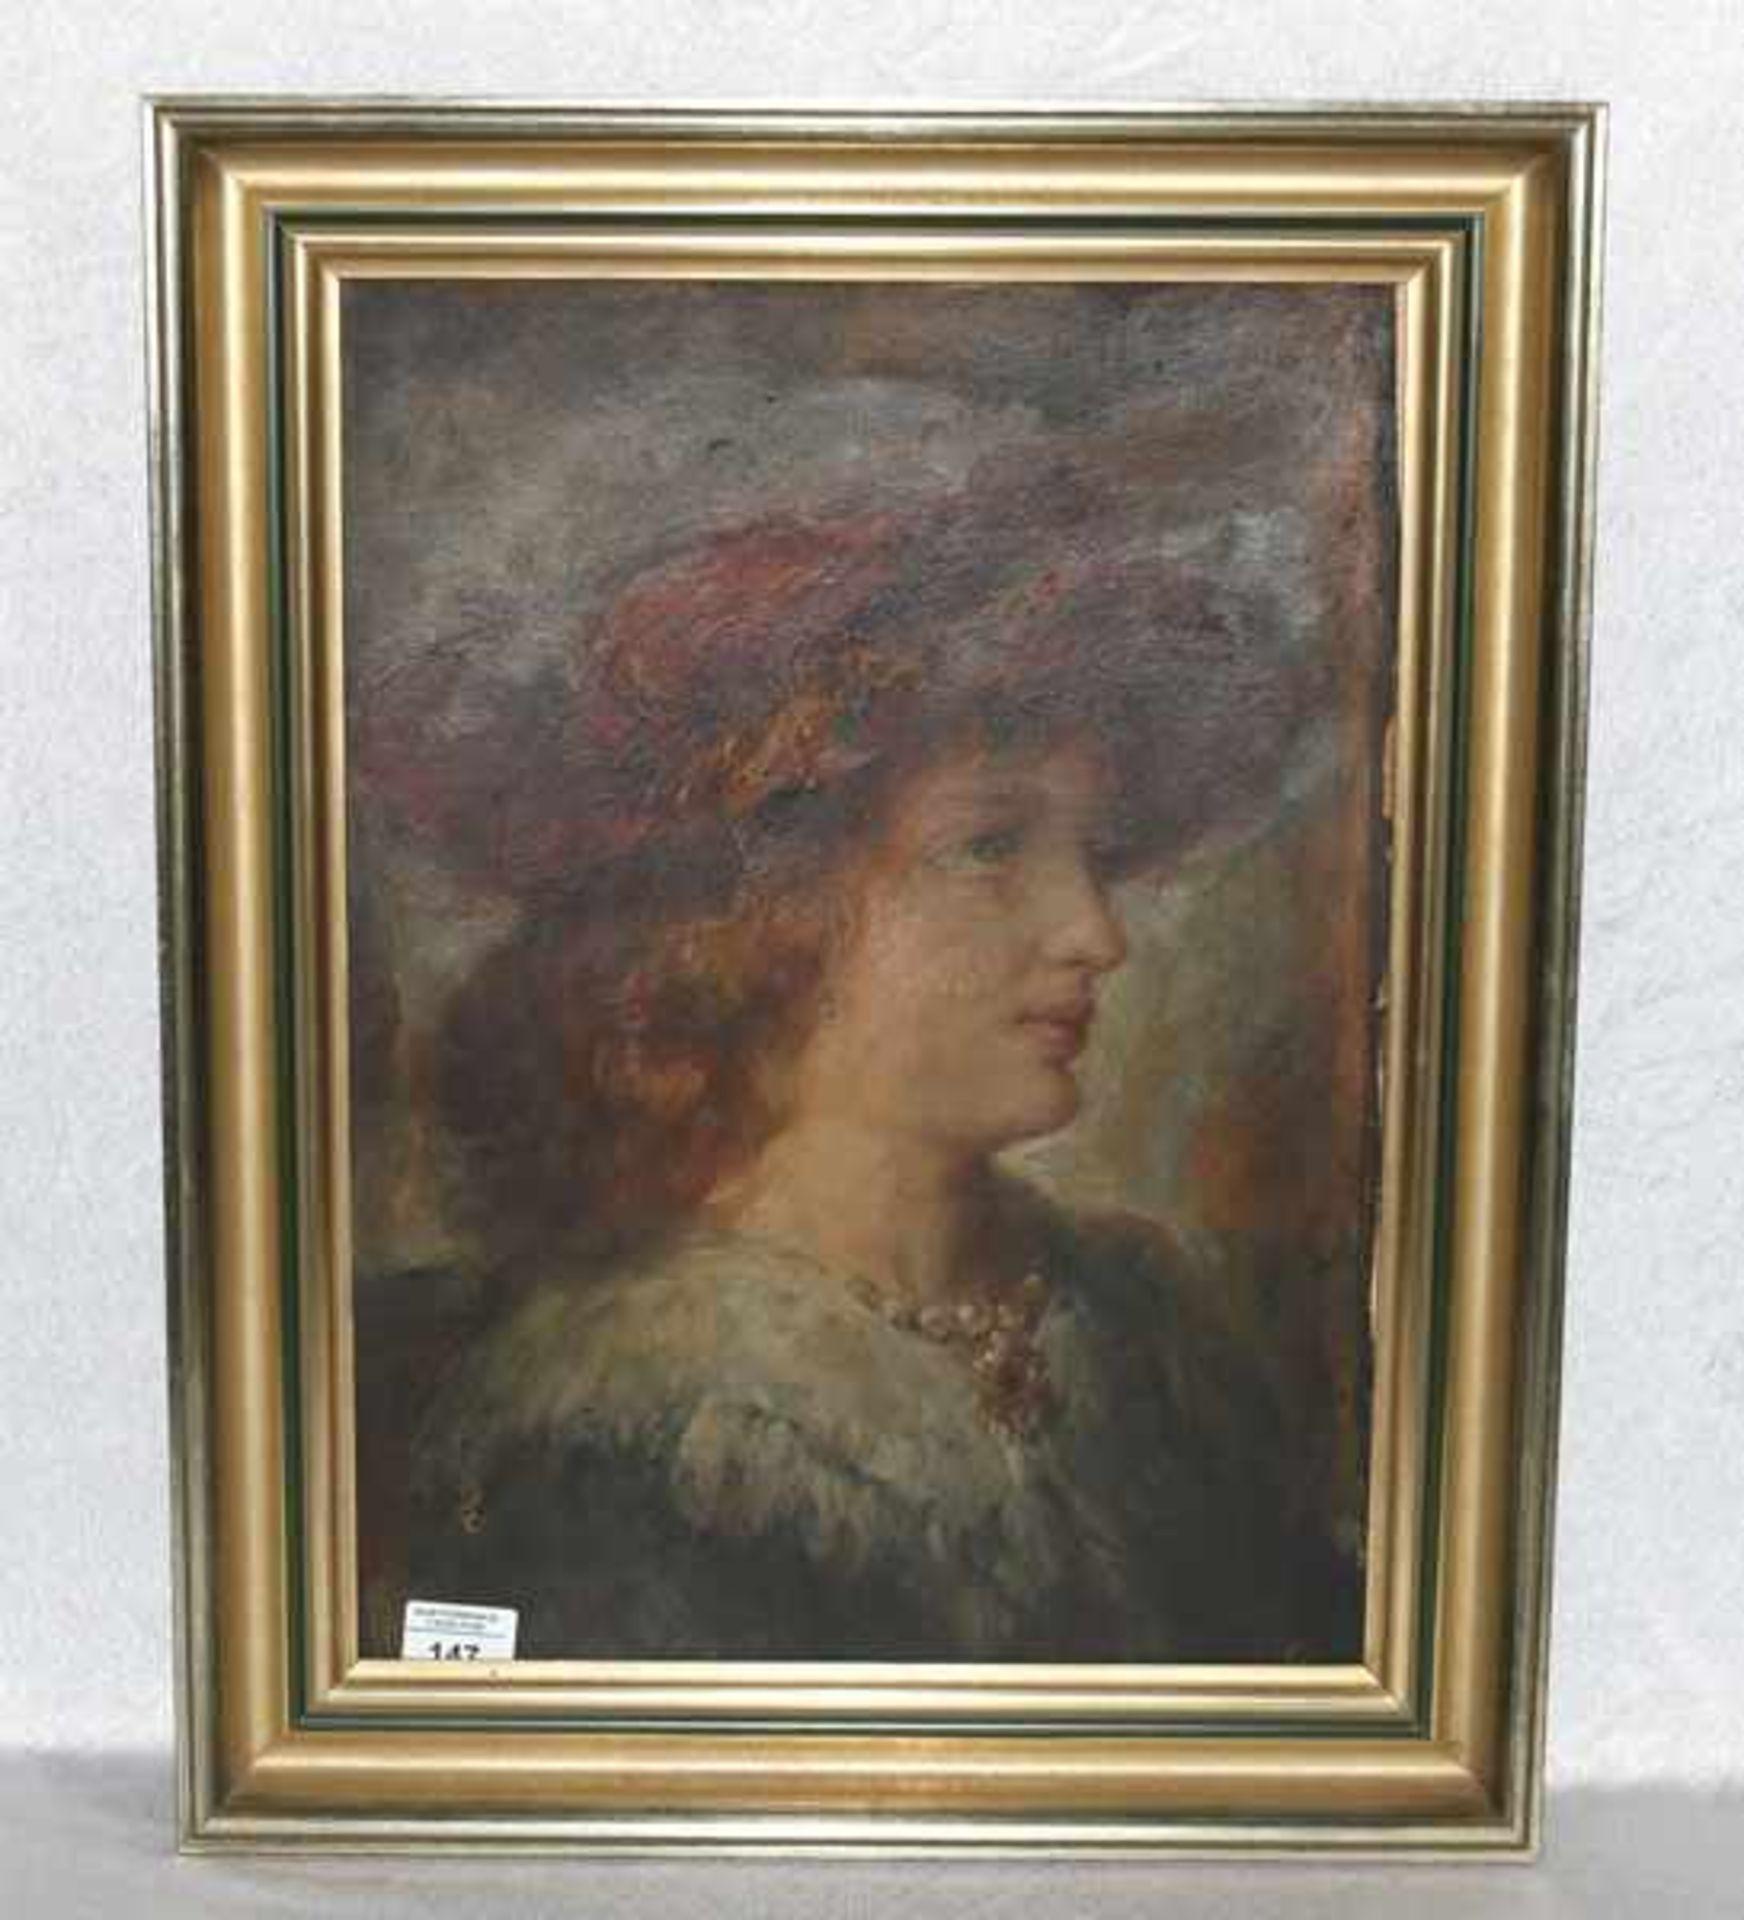 Los 147 - Gemälde ÖL/Malkarton 'Damenbildnis', Bildoberfläche leicht beschädigt, gerahmt, incl. Rahmen 59 cm x